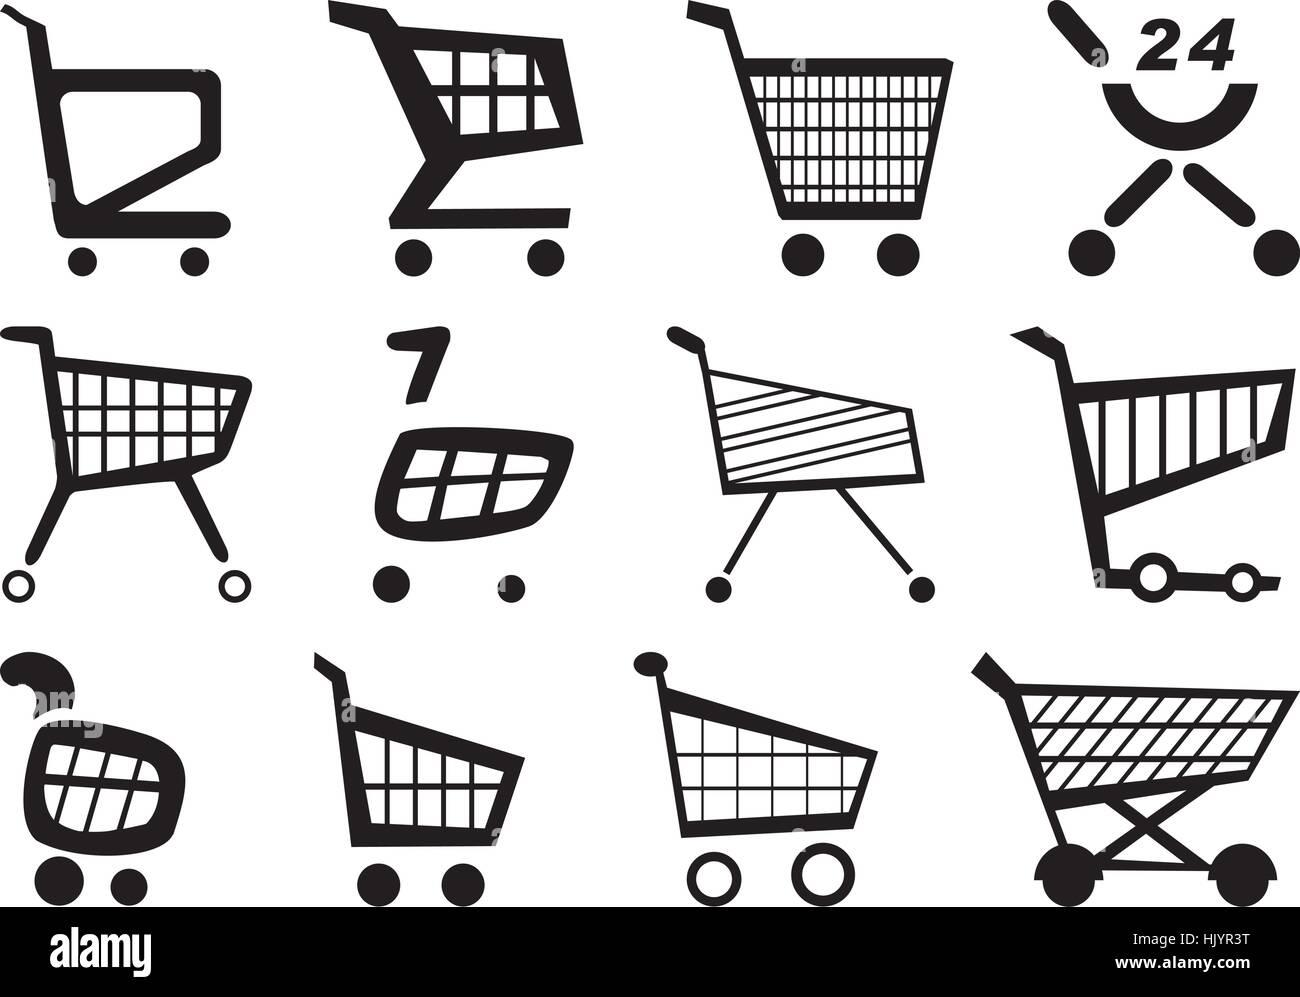 Pushing a shopping cart. Einkaufswagen. - Stock Image